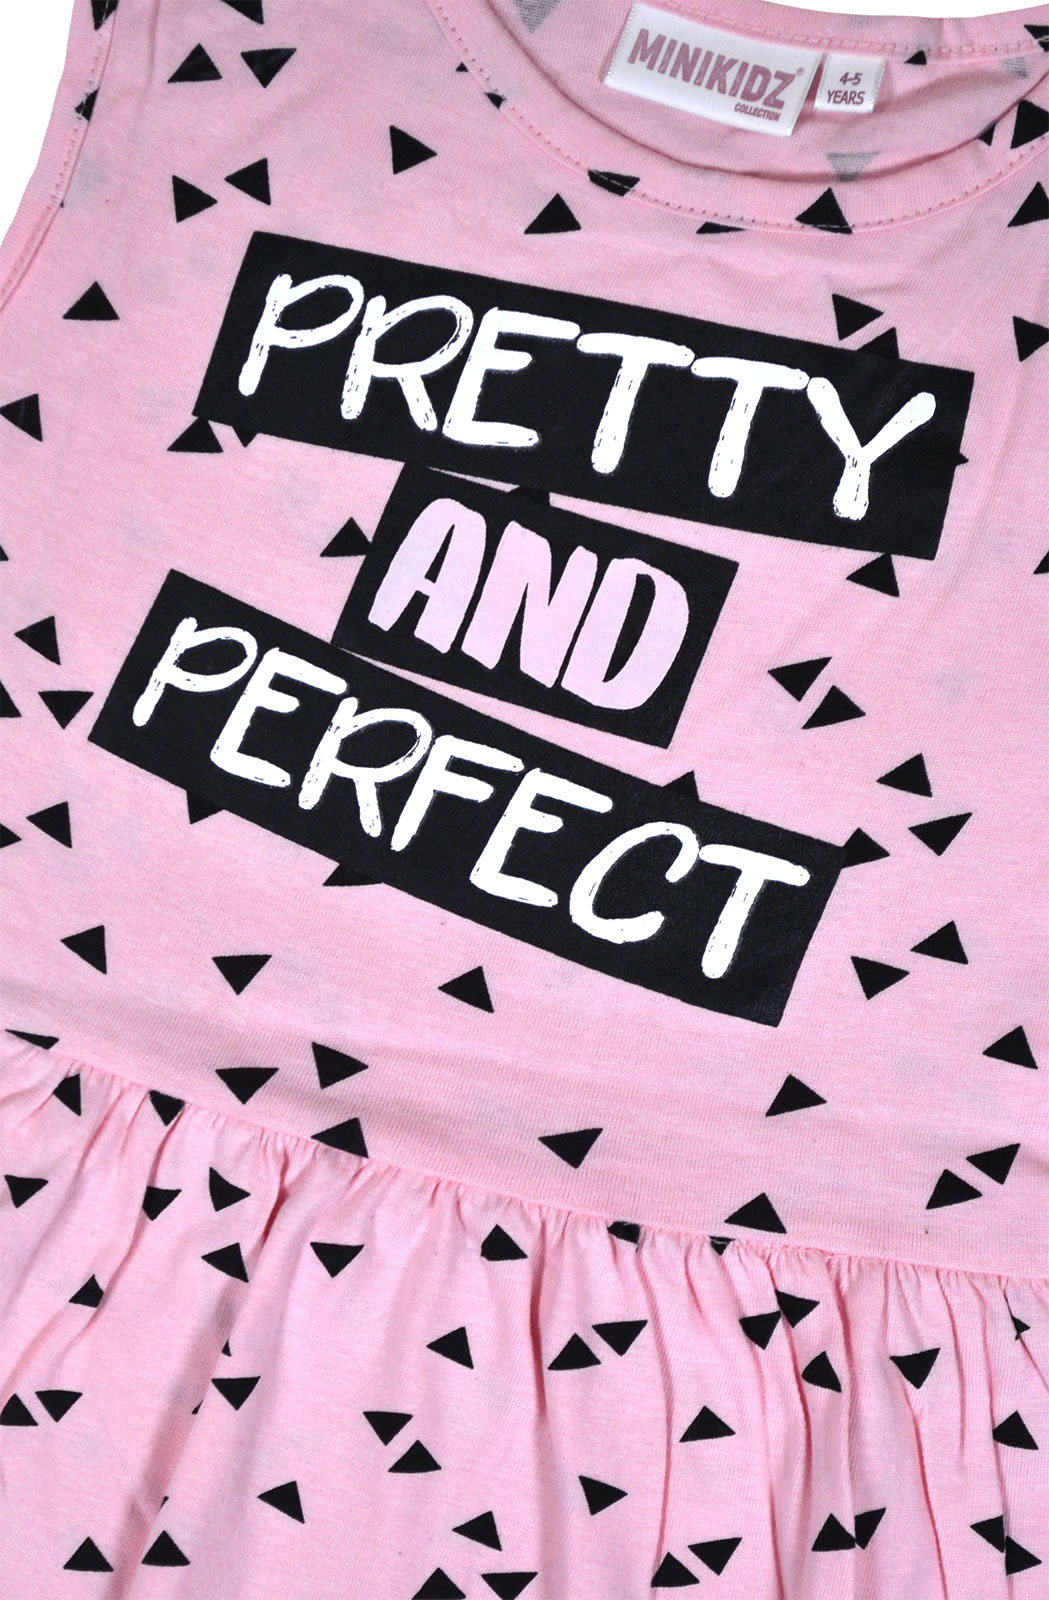 Girls-Summer-Dress-Kids-New-Skater-Dress-Cotton-Pink-Black-Age-2-3-4-5-6-7-8-Yrs thumbnail 3